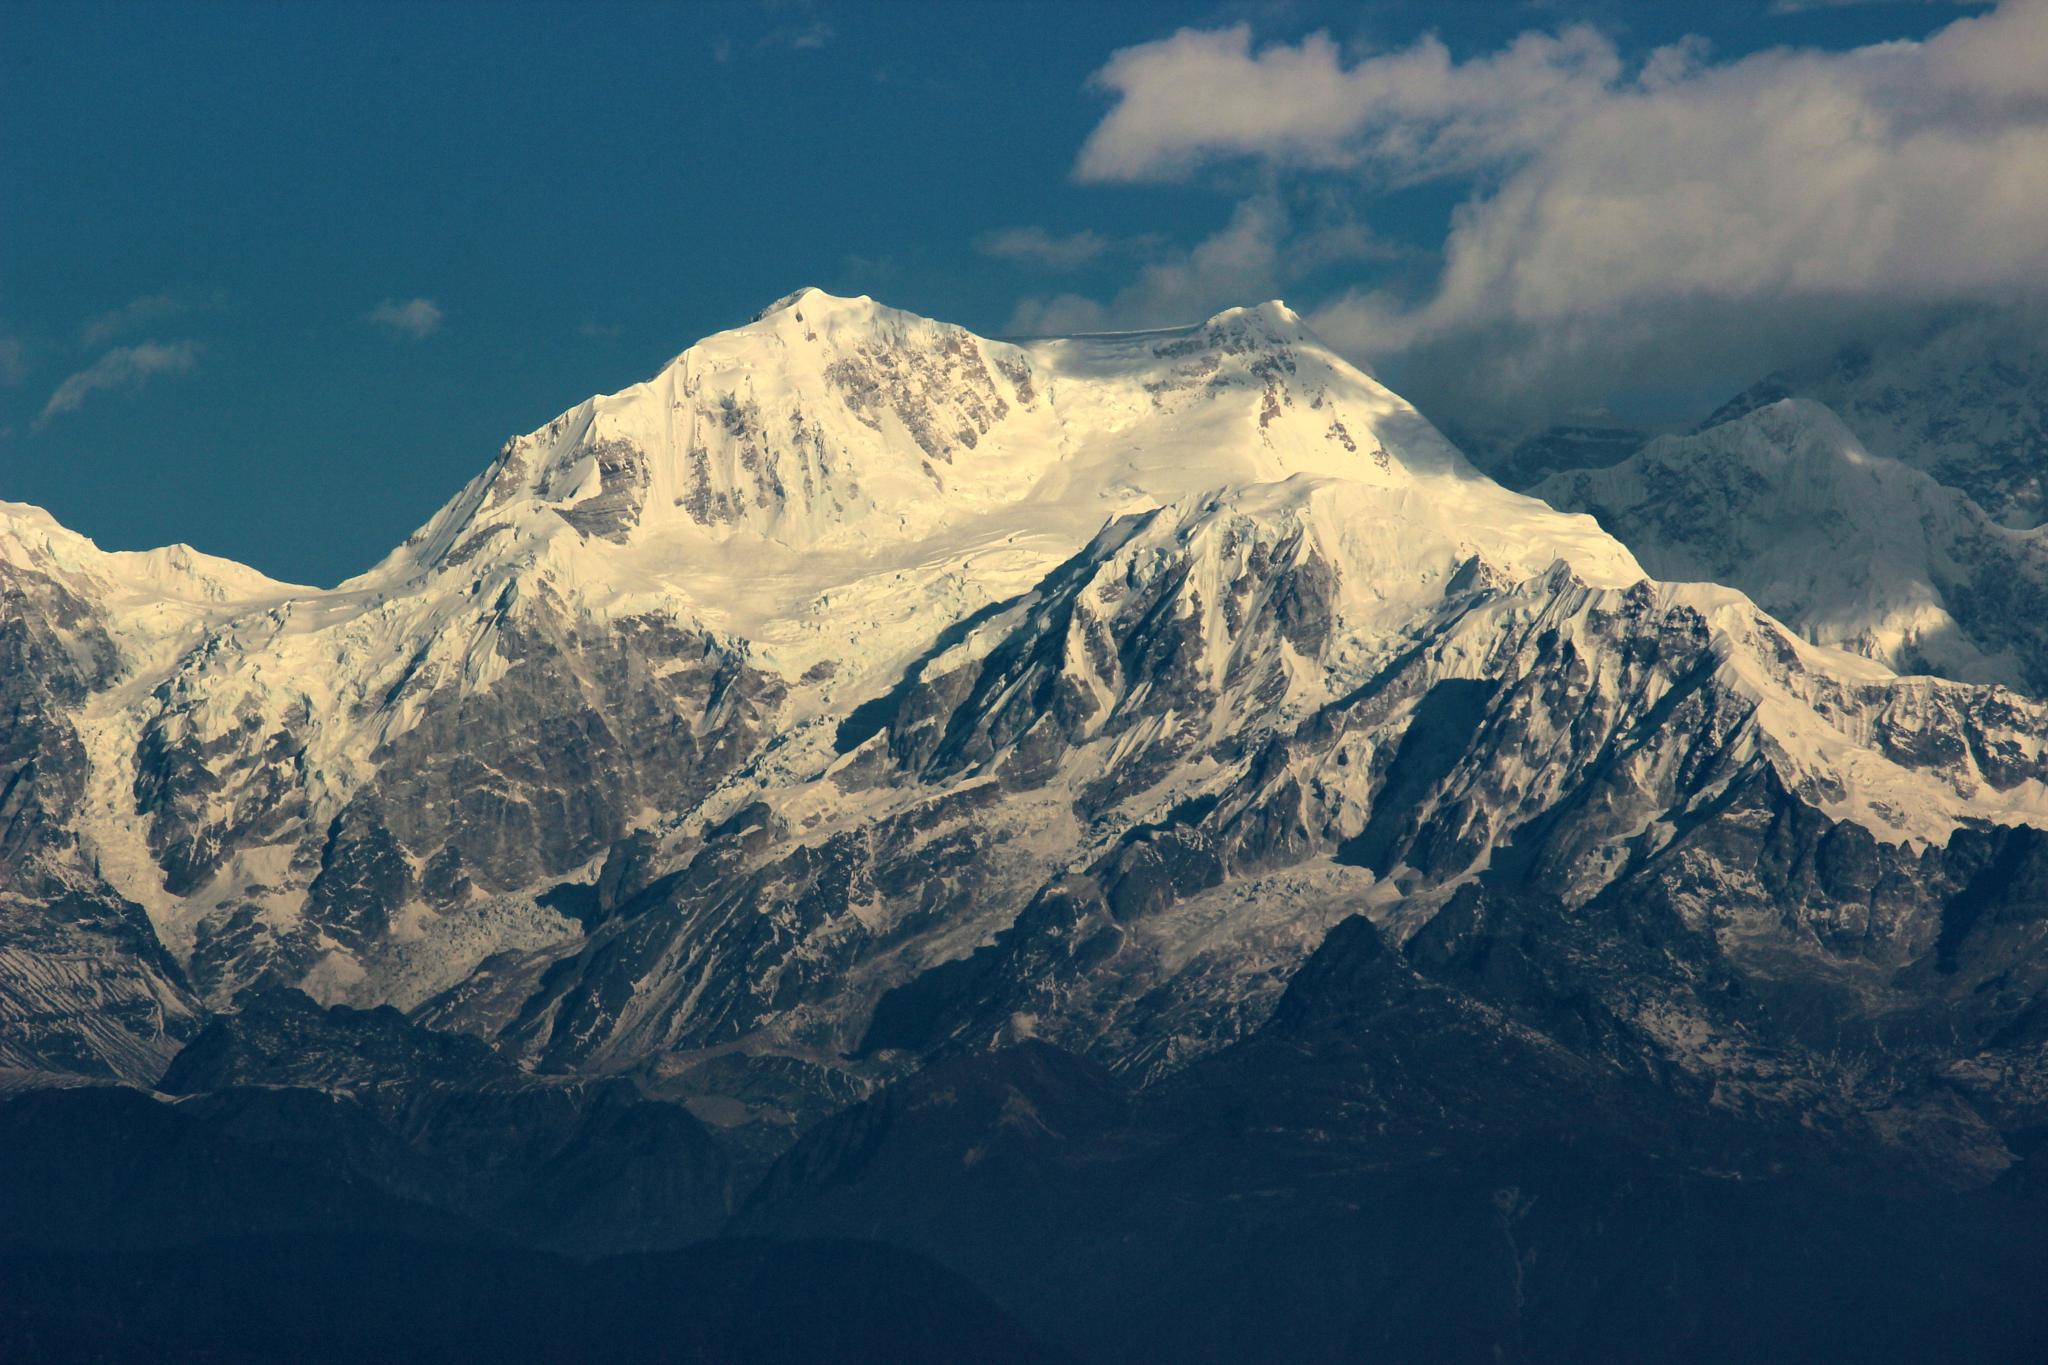 Snow-Laden Peaks by Sourajit Sarkar